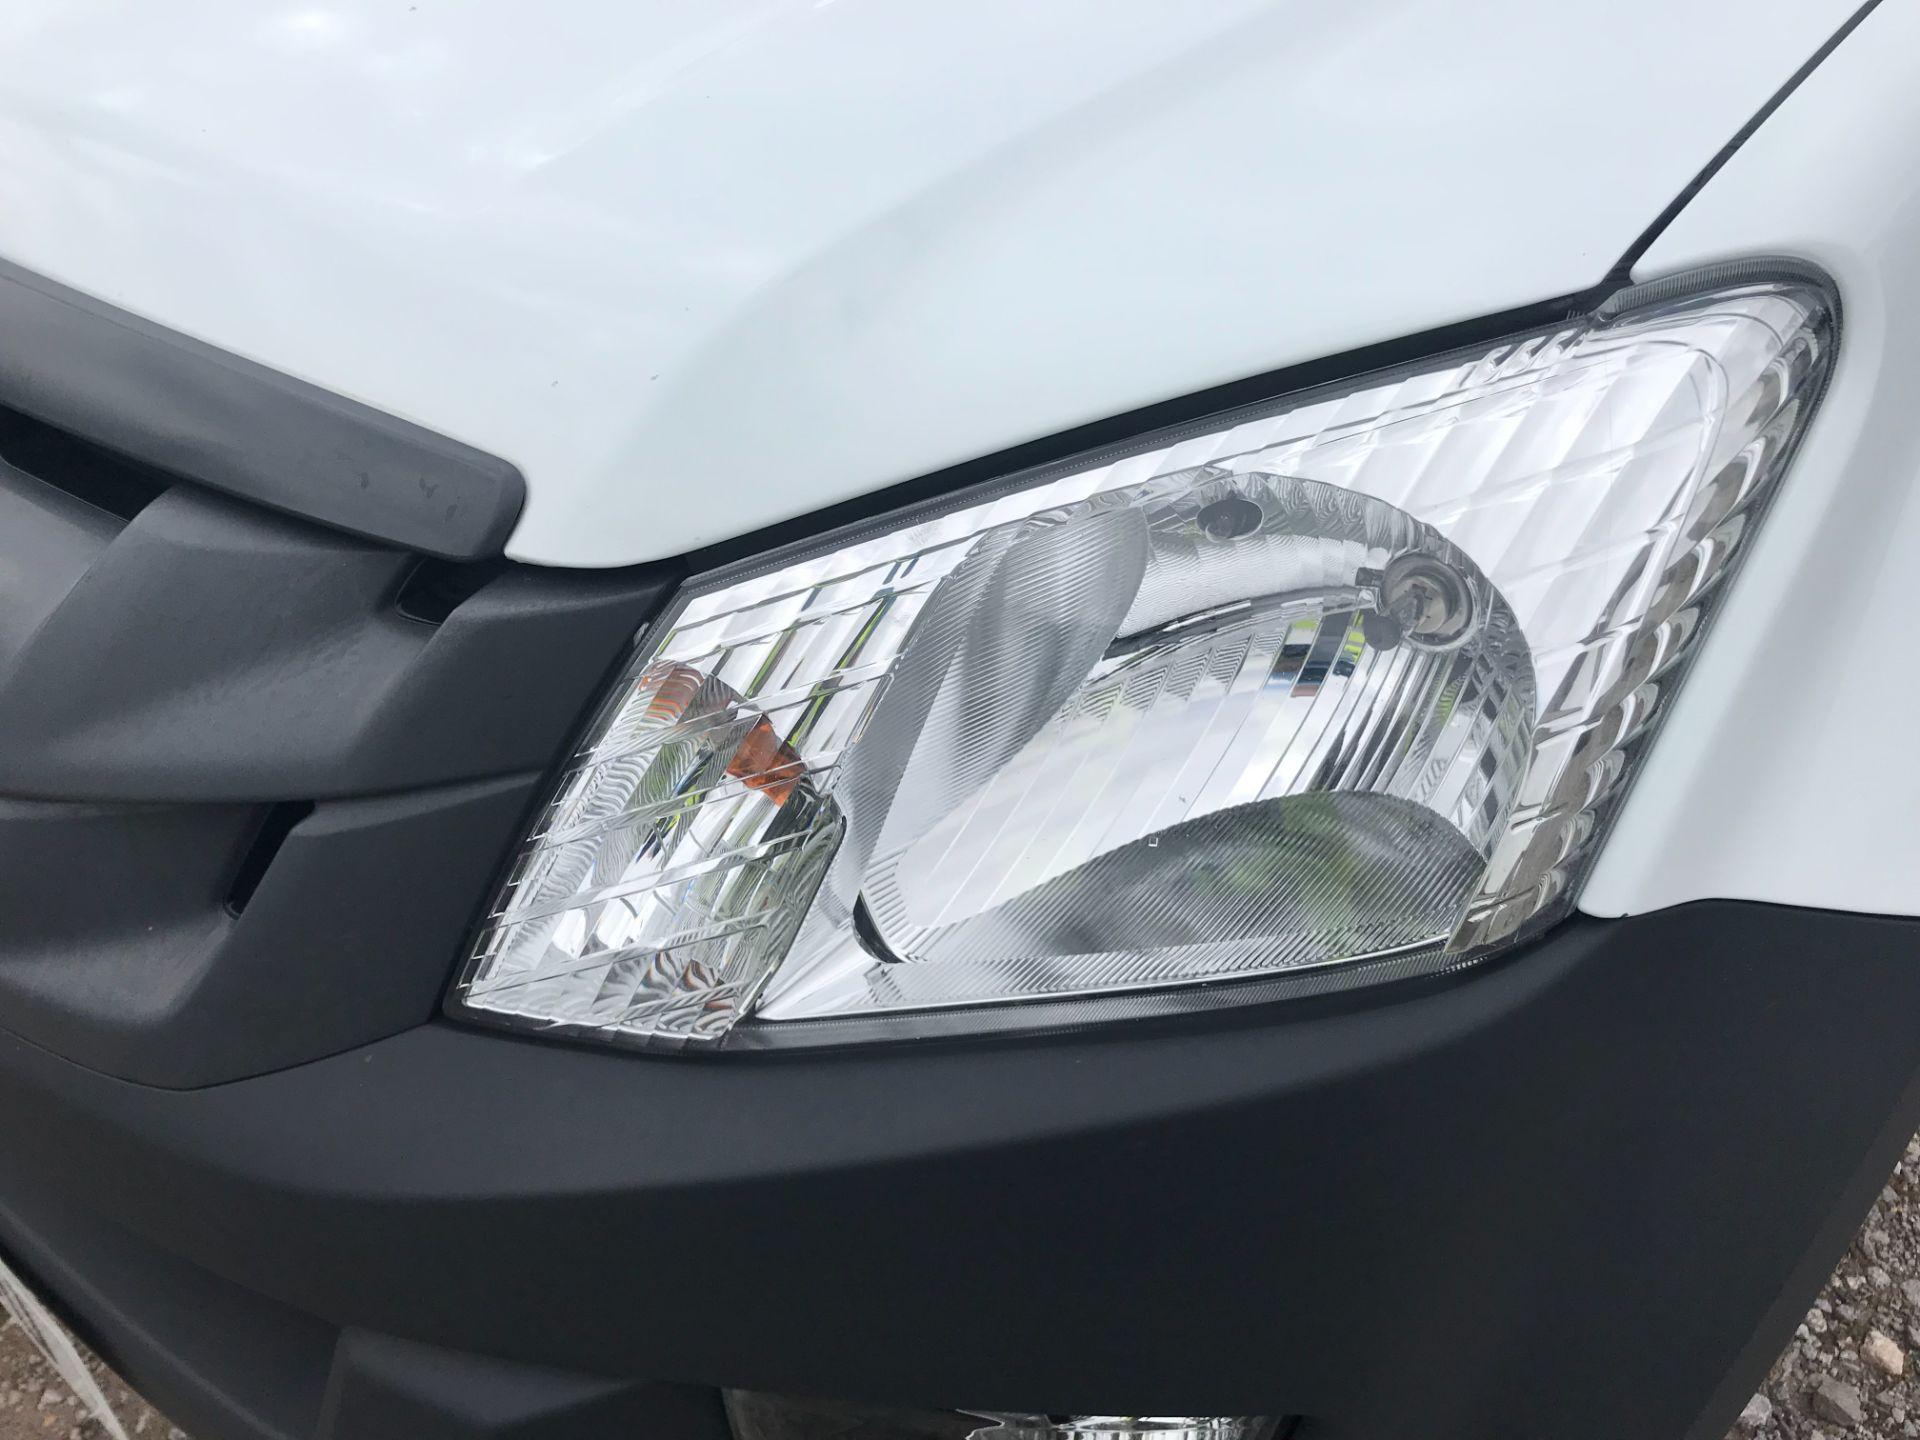 2017 Isuzu D-Max Double Cab 4*4 2.5 TD EURO 5 (YG17WSU) Image 32